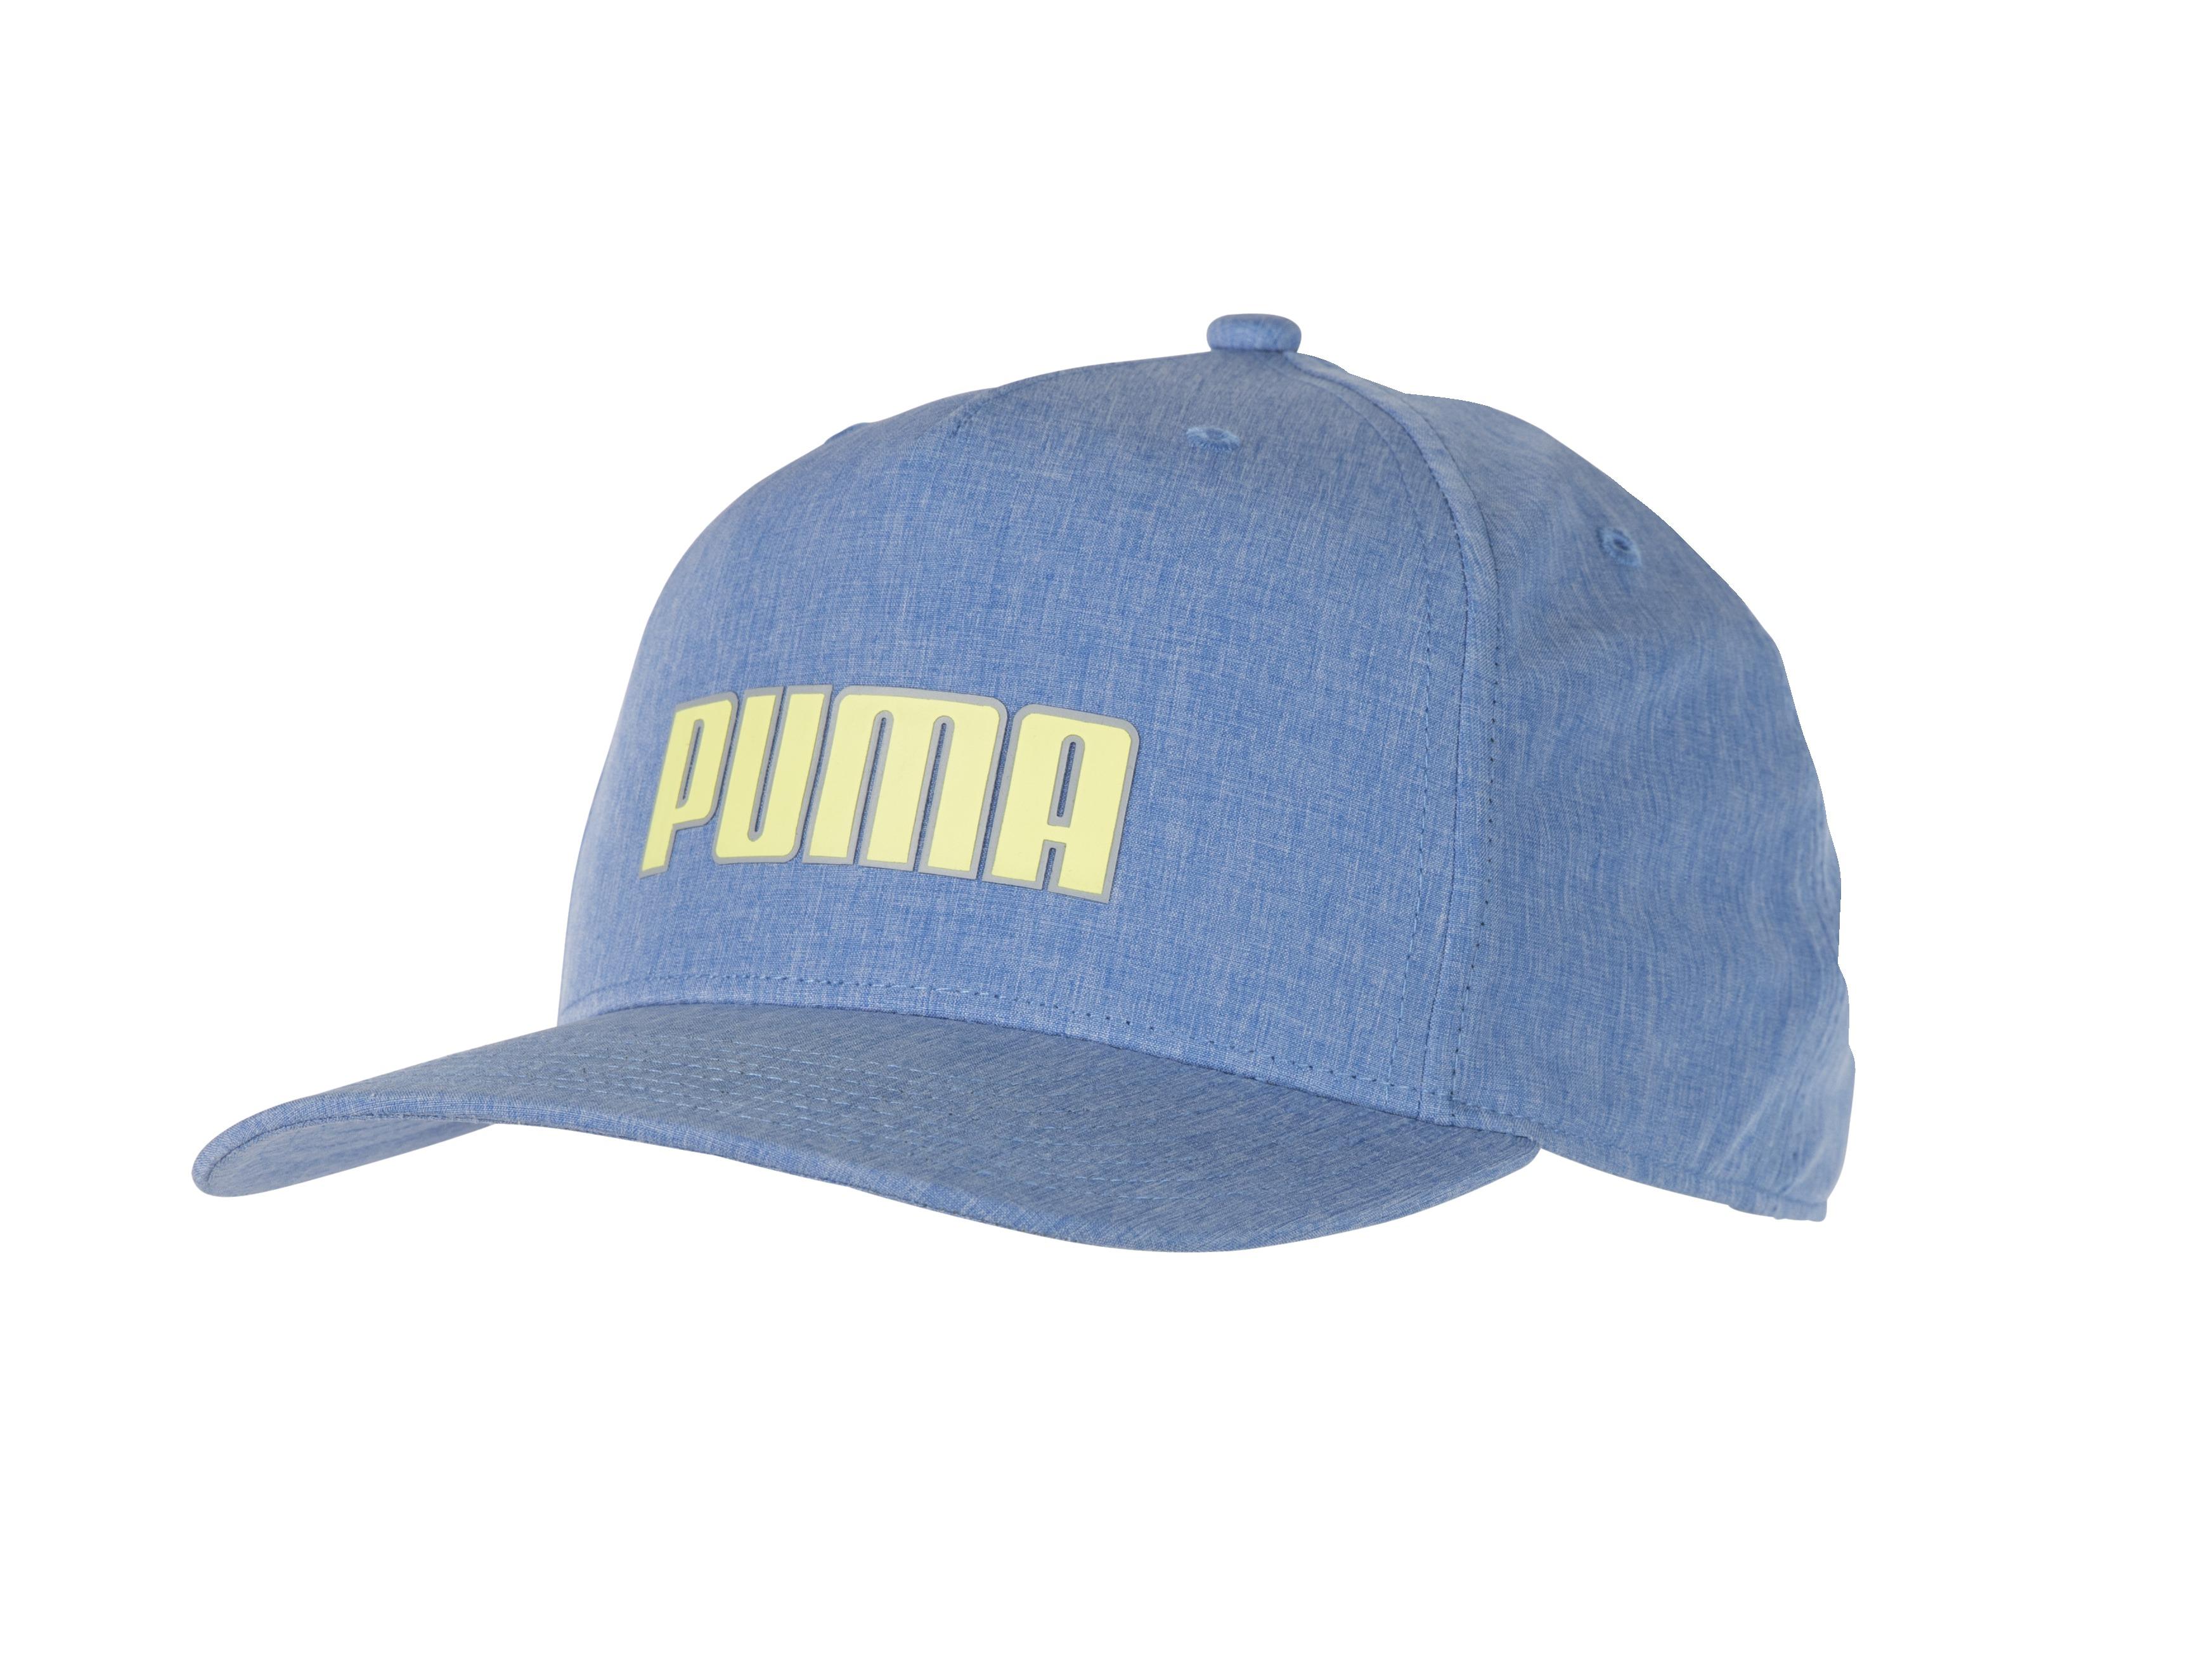 81da4c8a8fb Puma Golf -  GOTIME Flex Snapback Cap